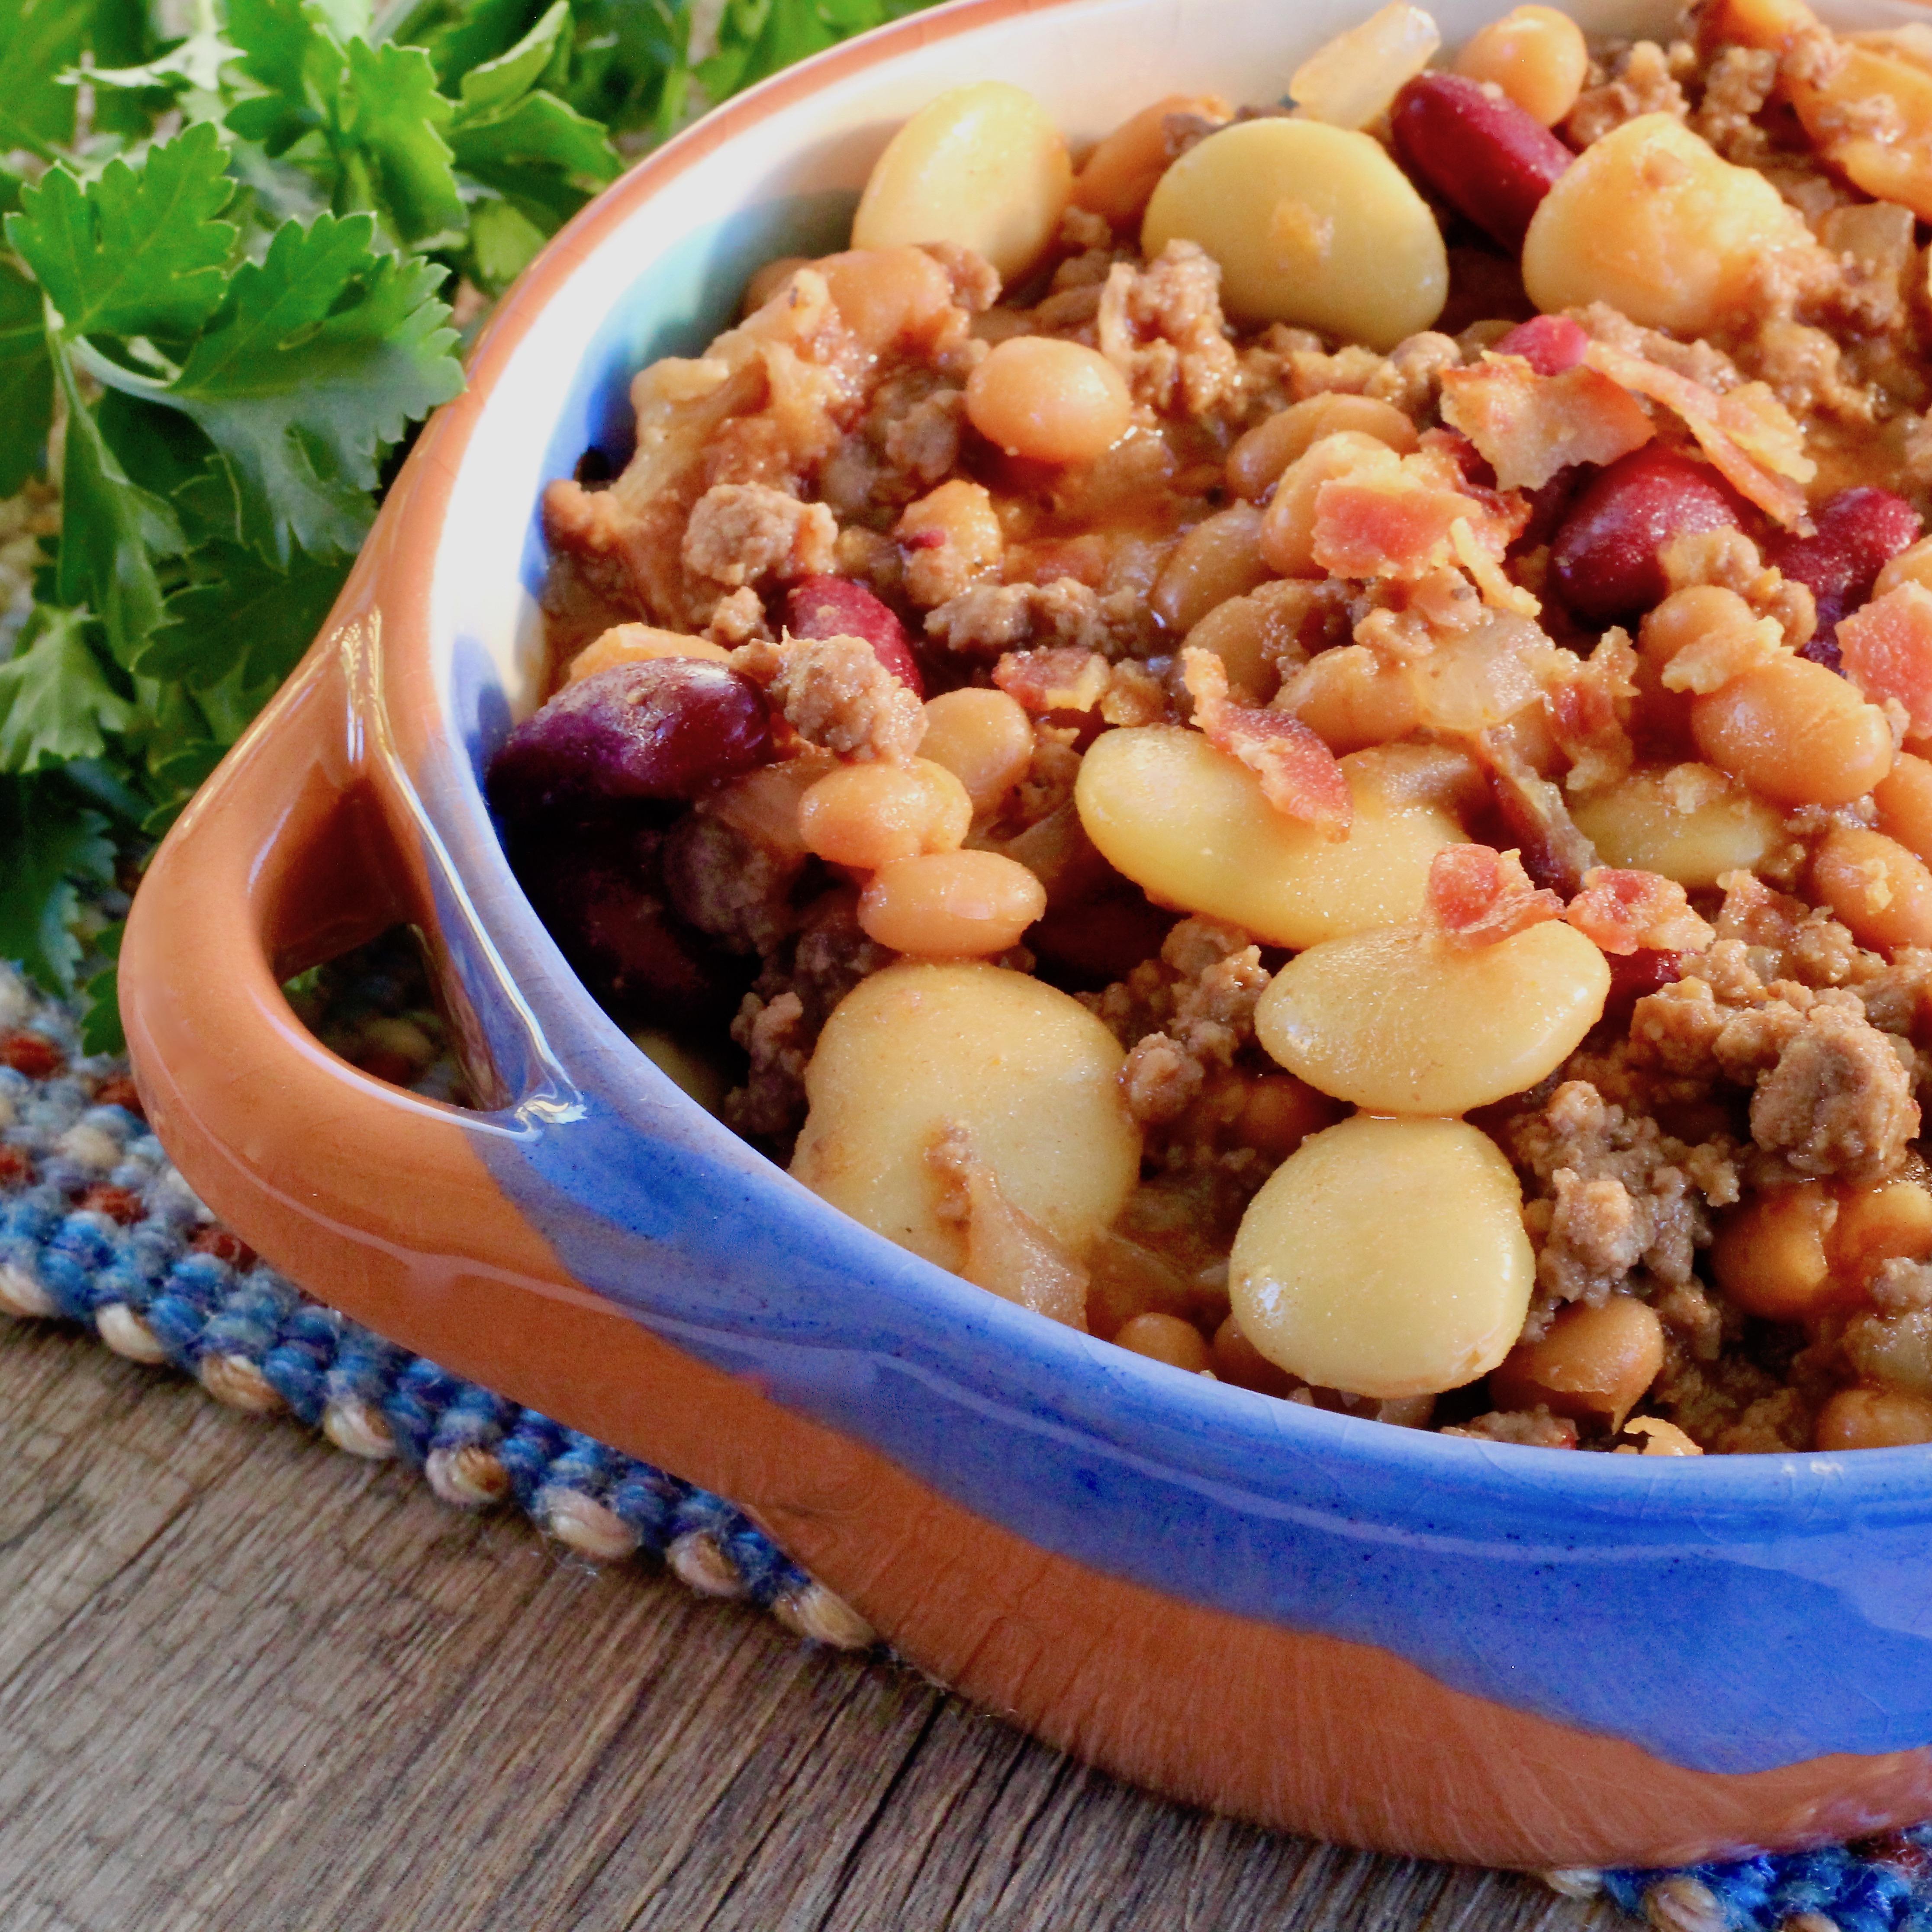 Betty's 3-Bean Hot Dish (a la Minnesota)